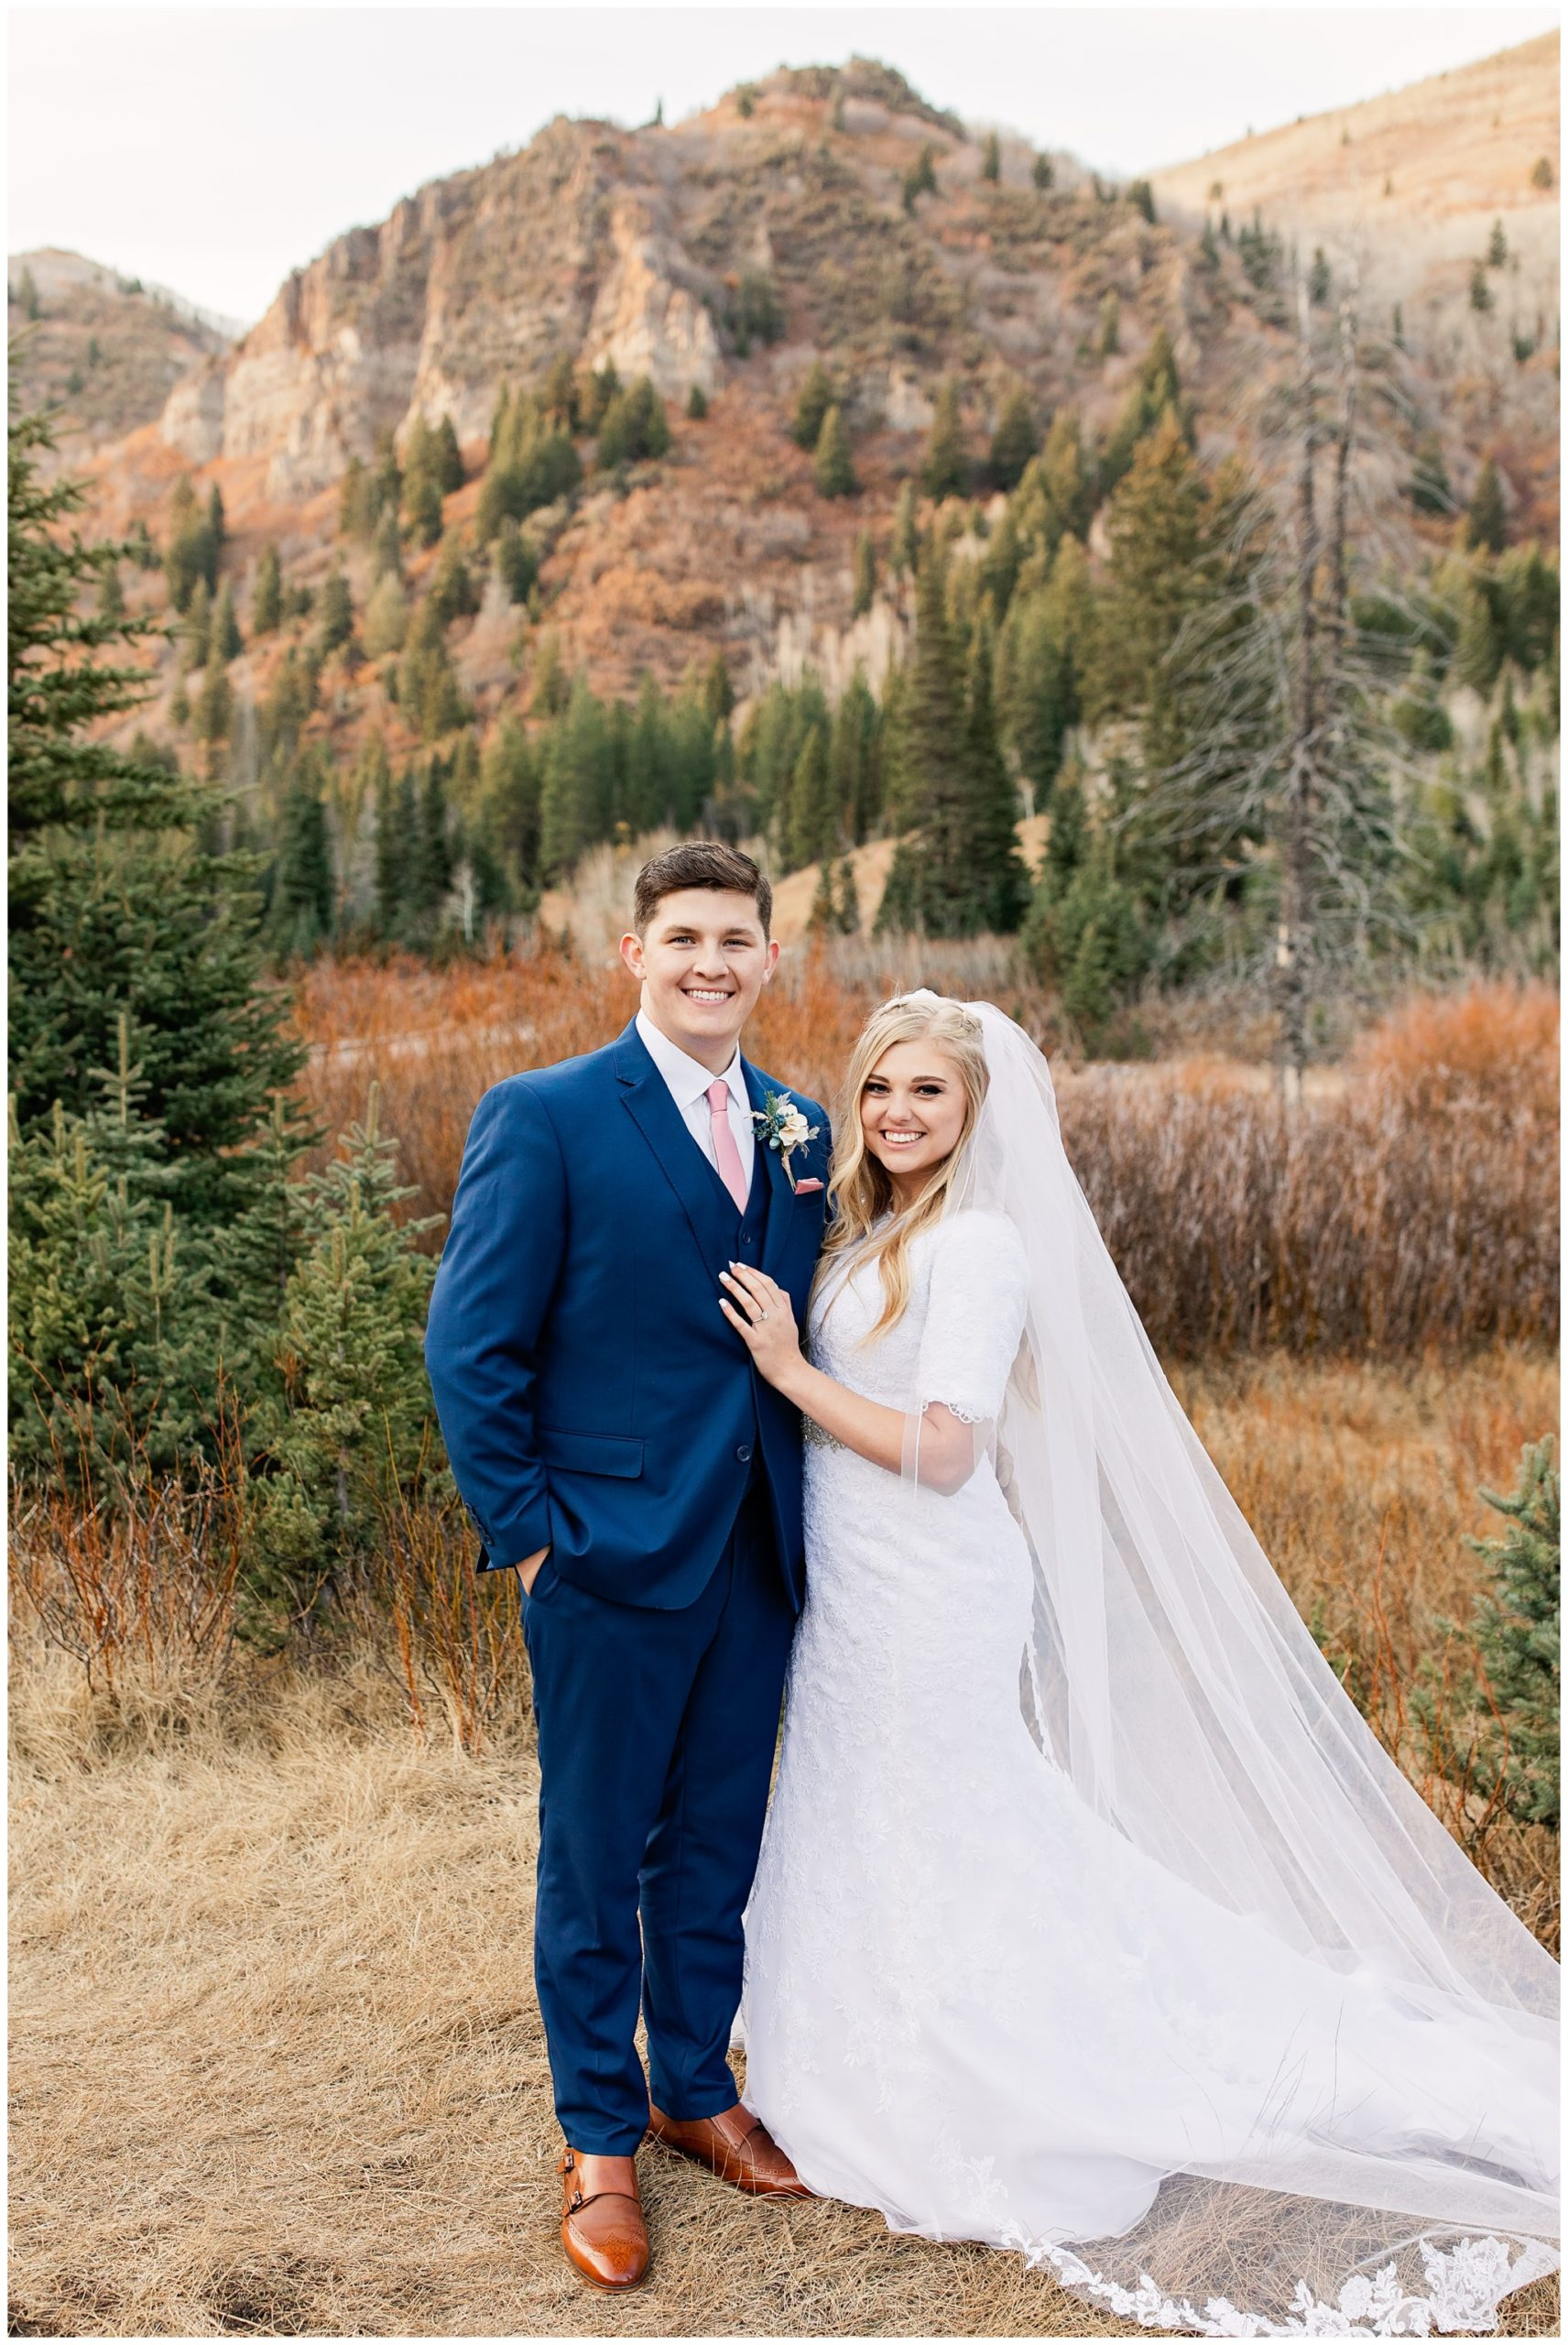 Fall bridals in Big cotton wood canyon UTAH